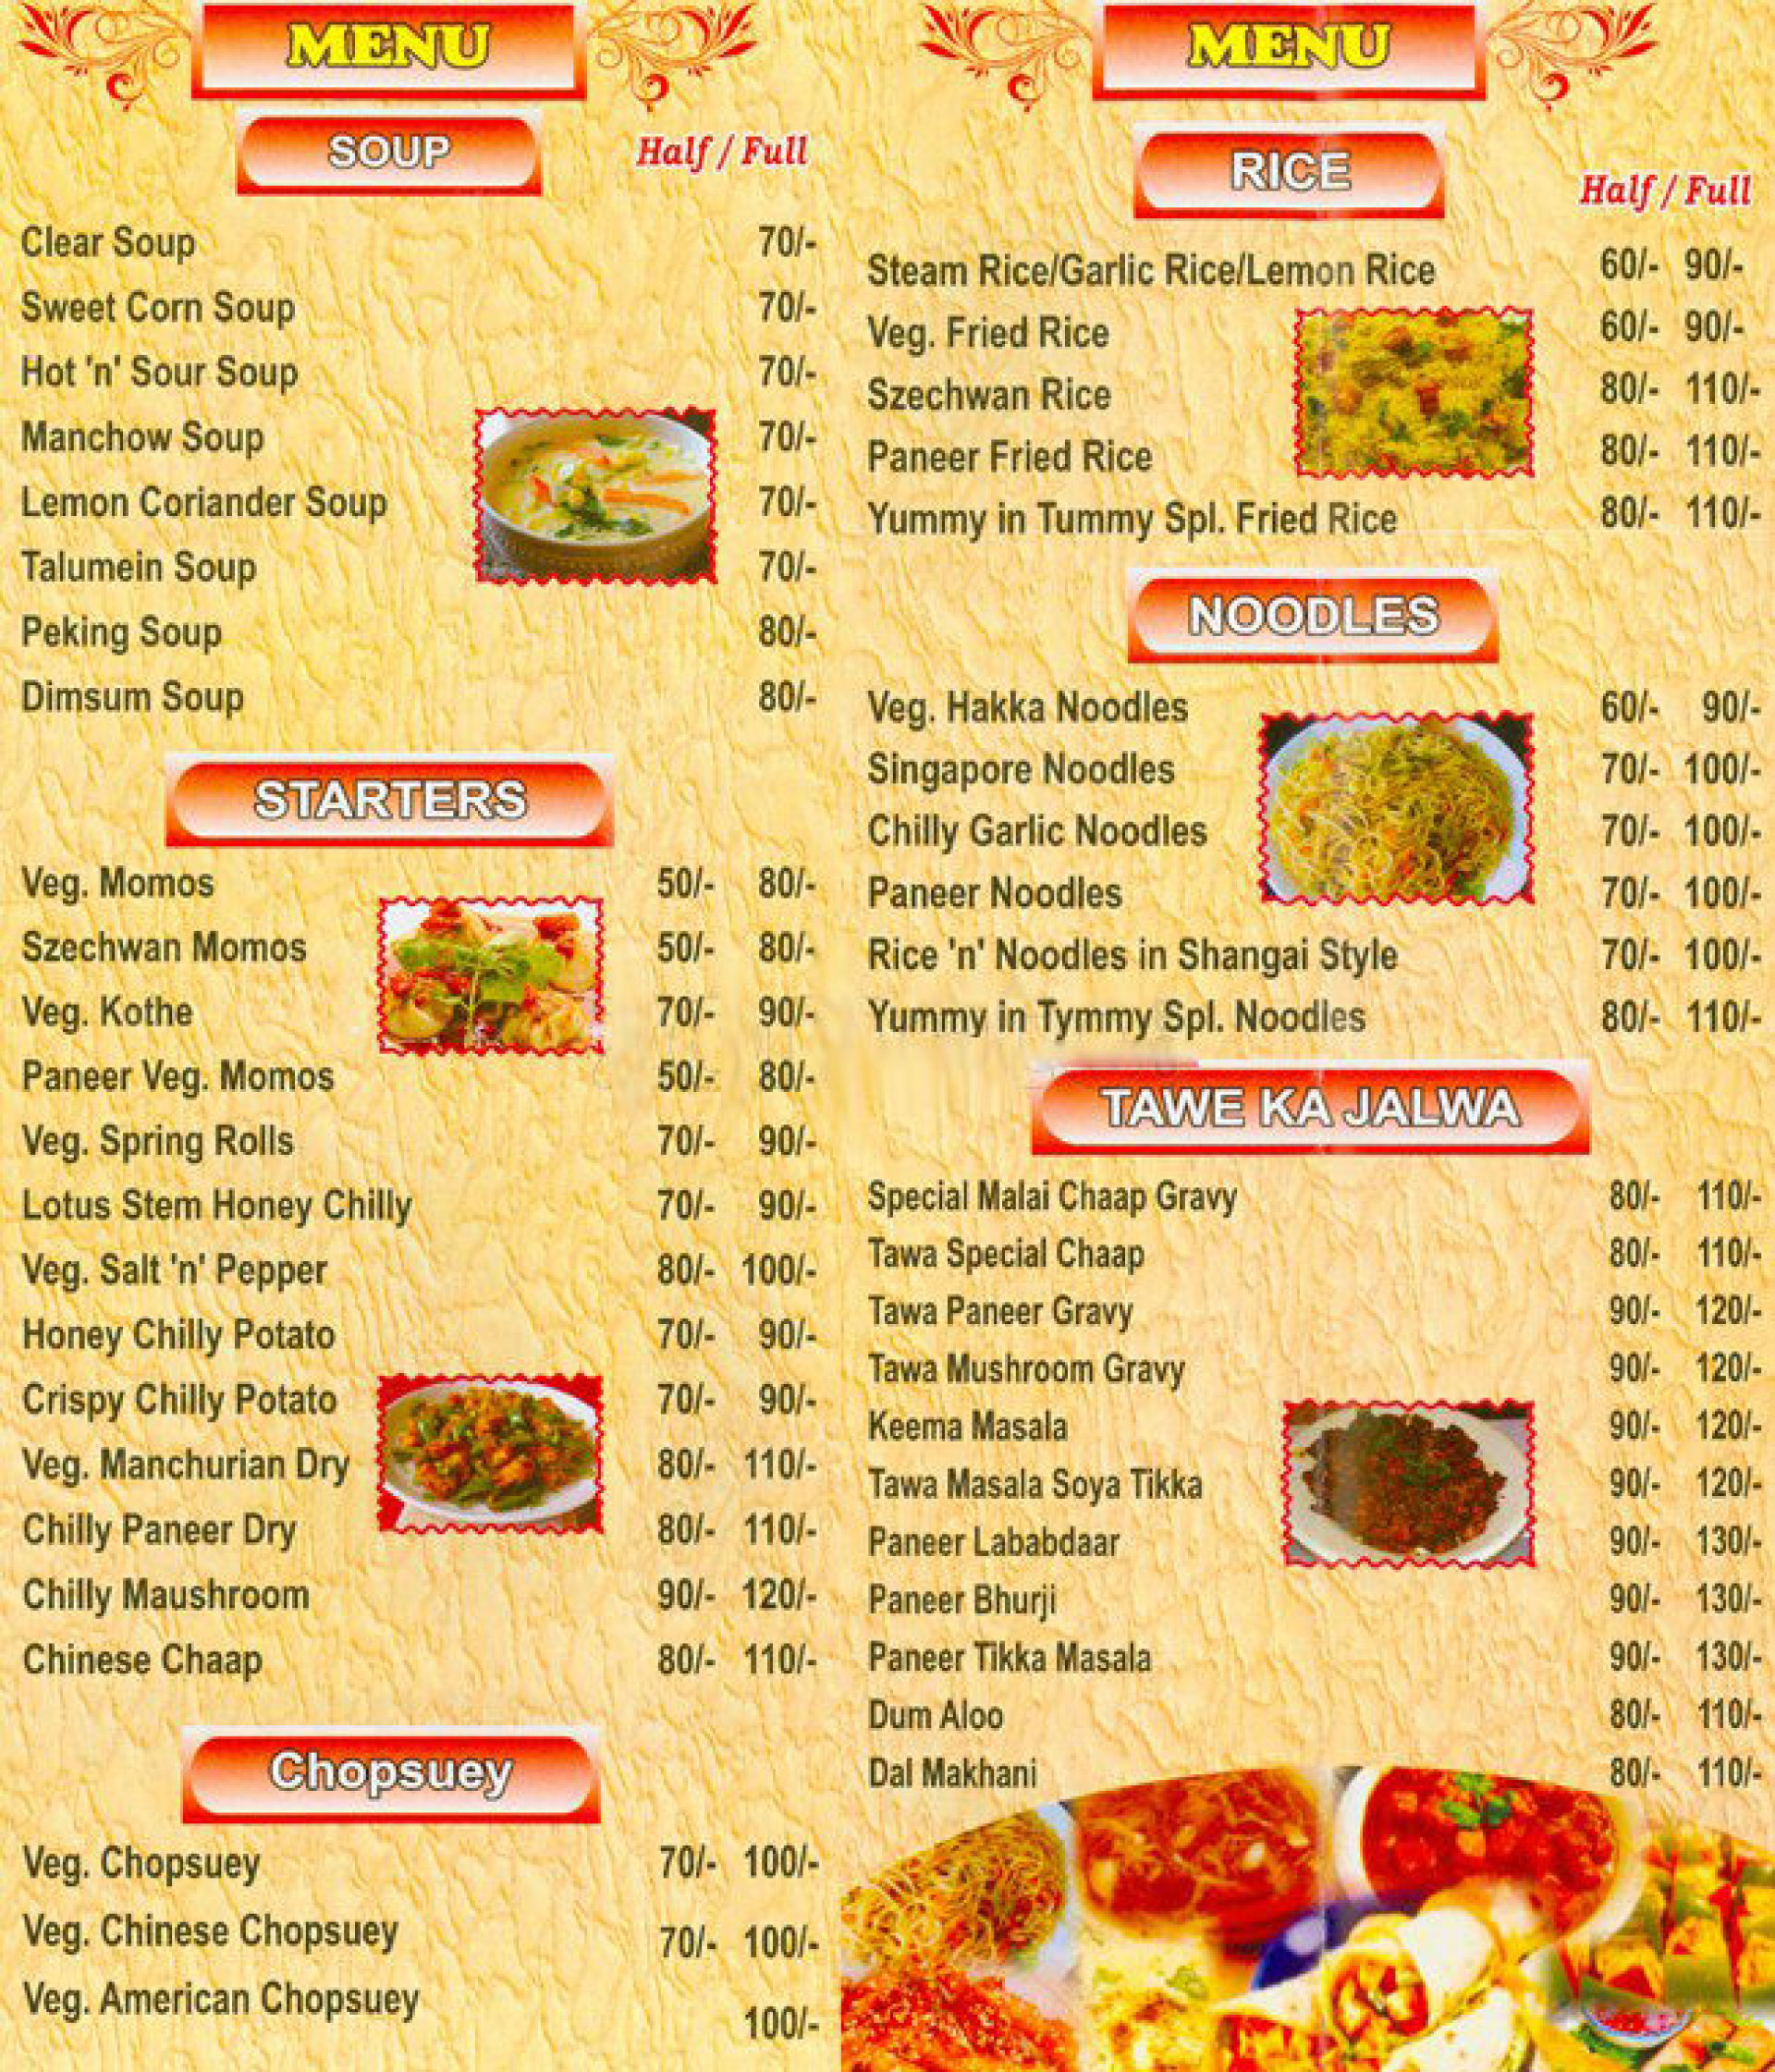 Kalsang - Home - Delhi, India - Menu, Prices, Restaurant